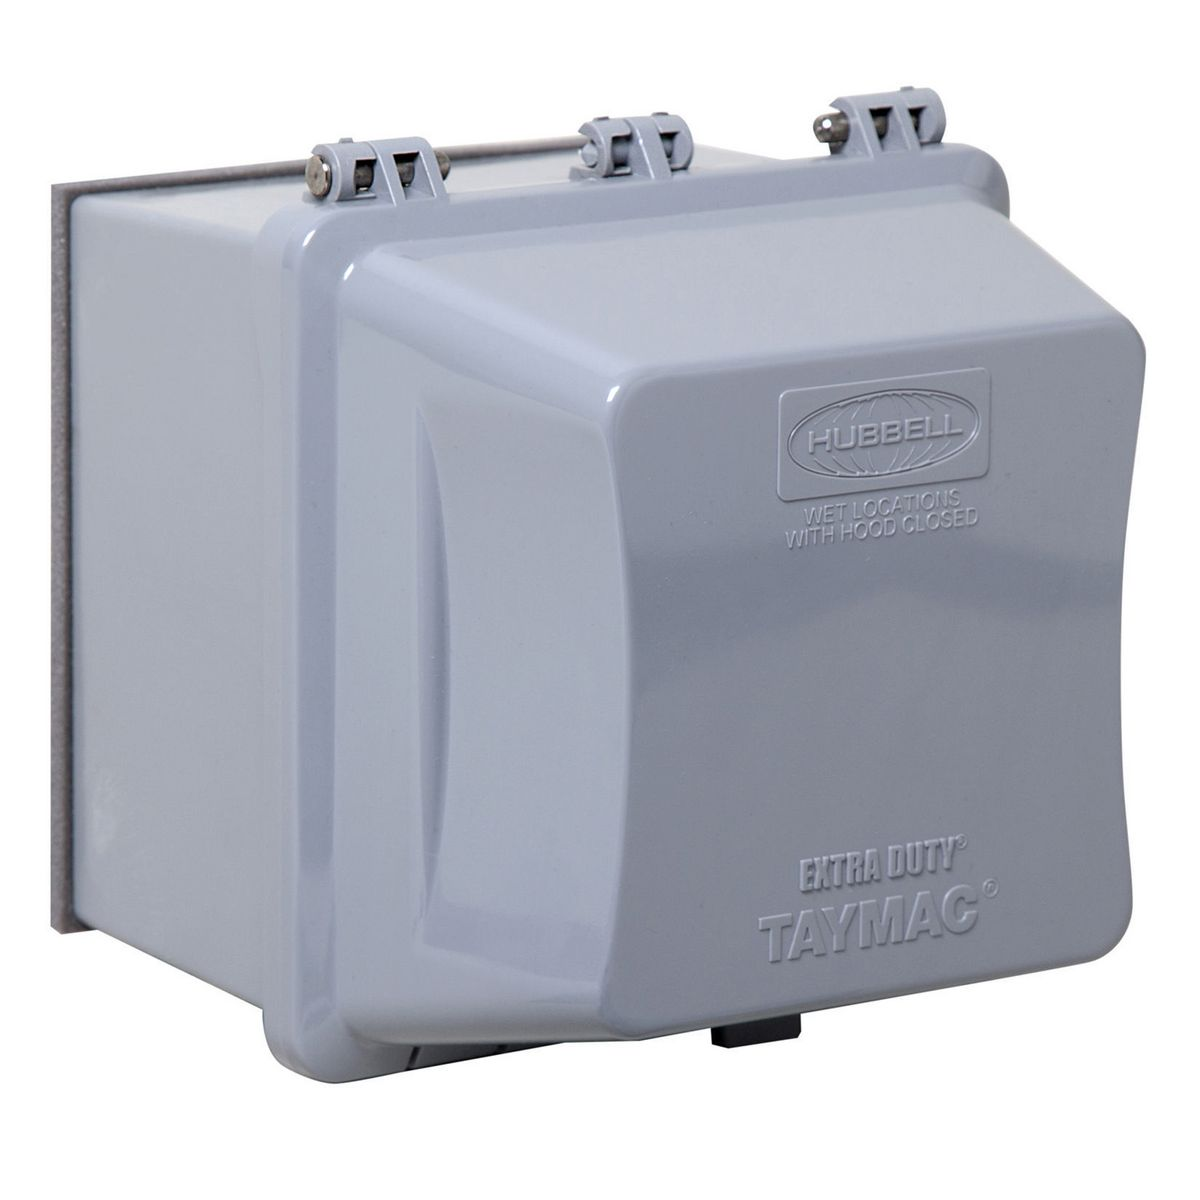 Electrical Weatherproof Lock Box: MM7420G